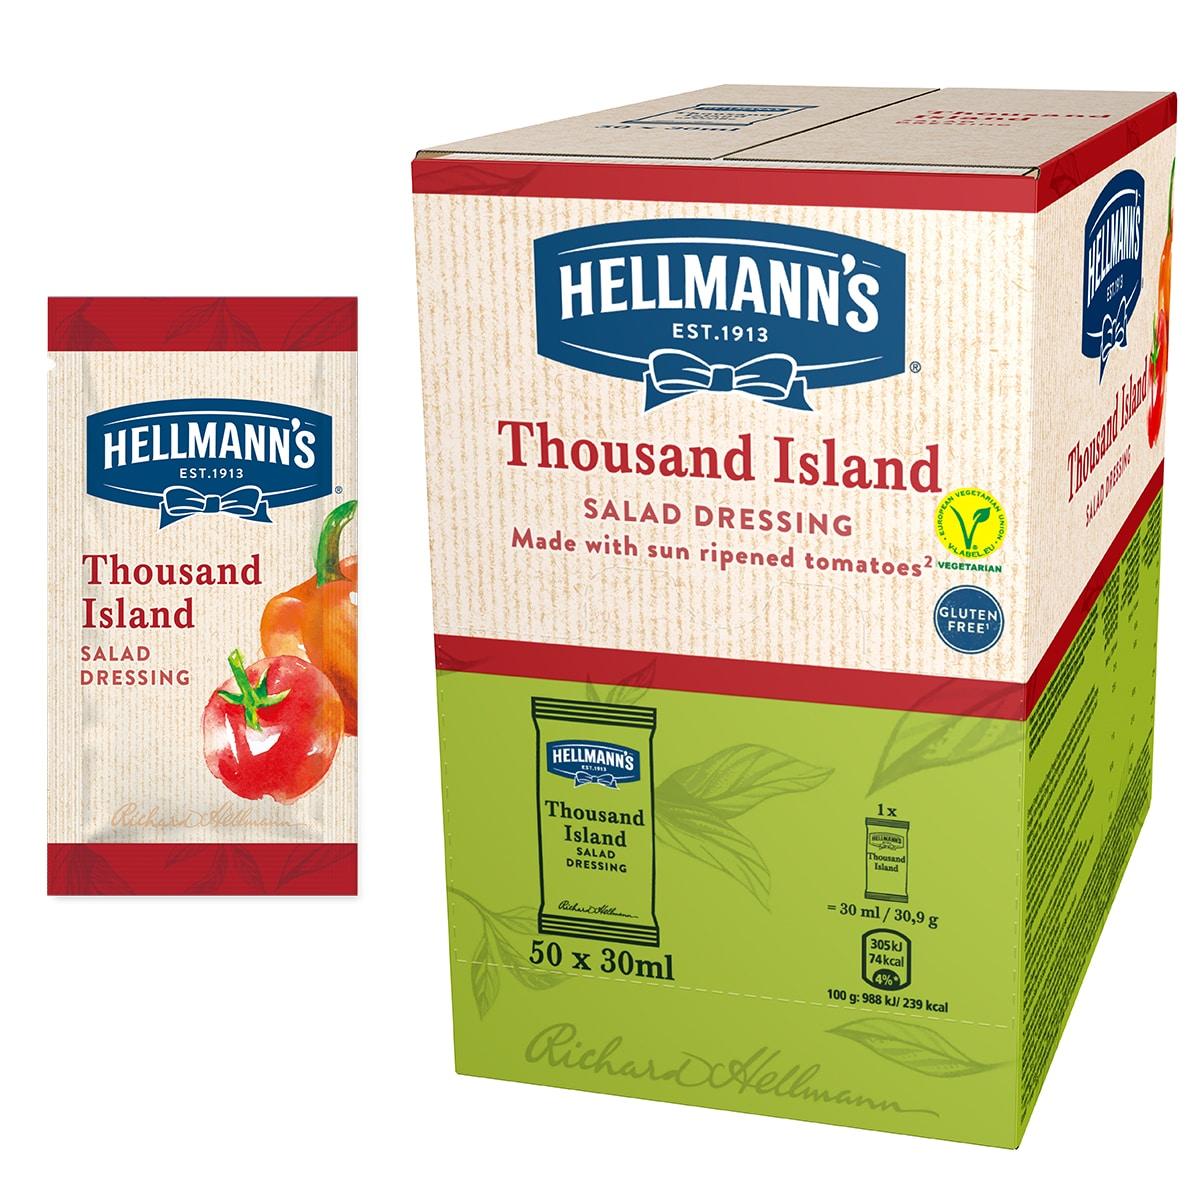 Hellmann's 1000 island solatni preliv 30 ml